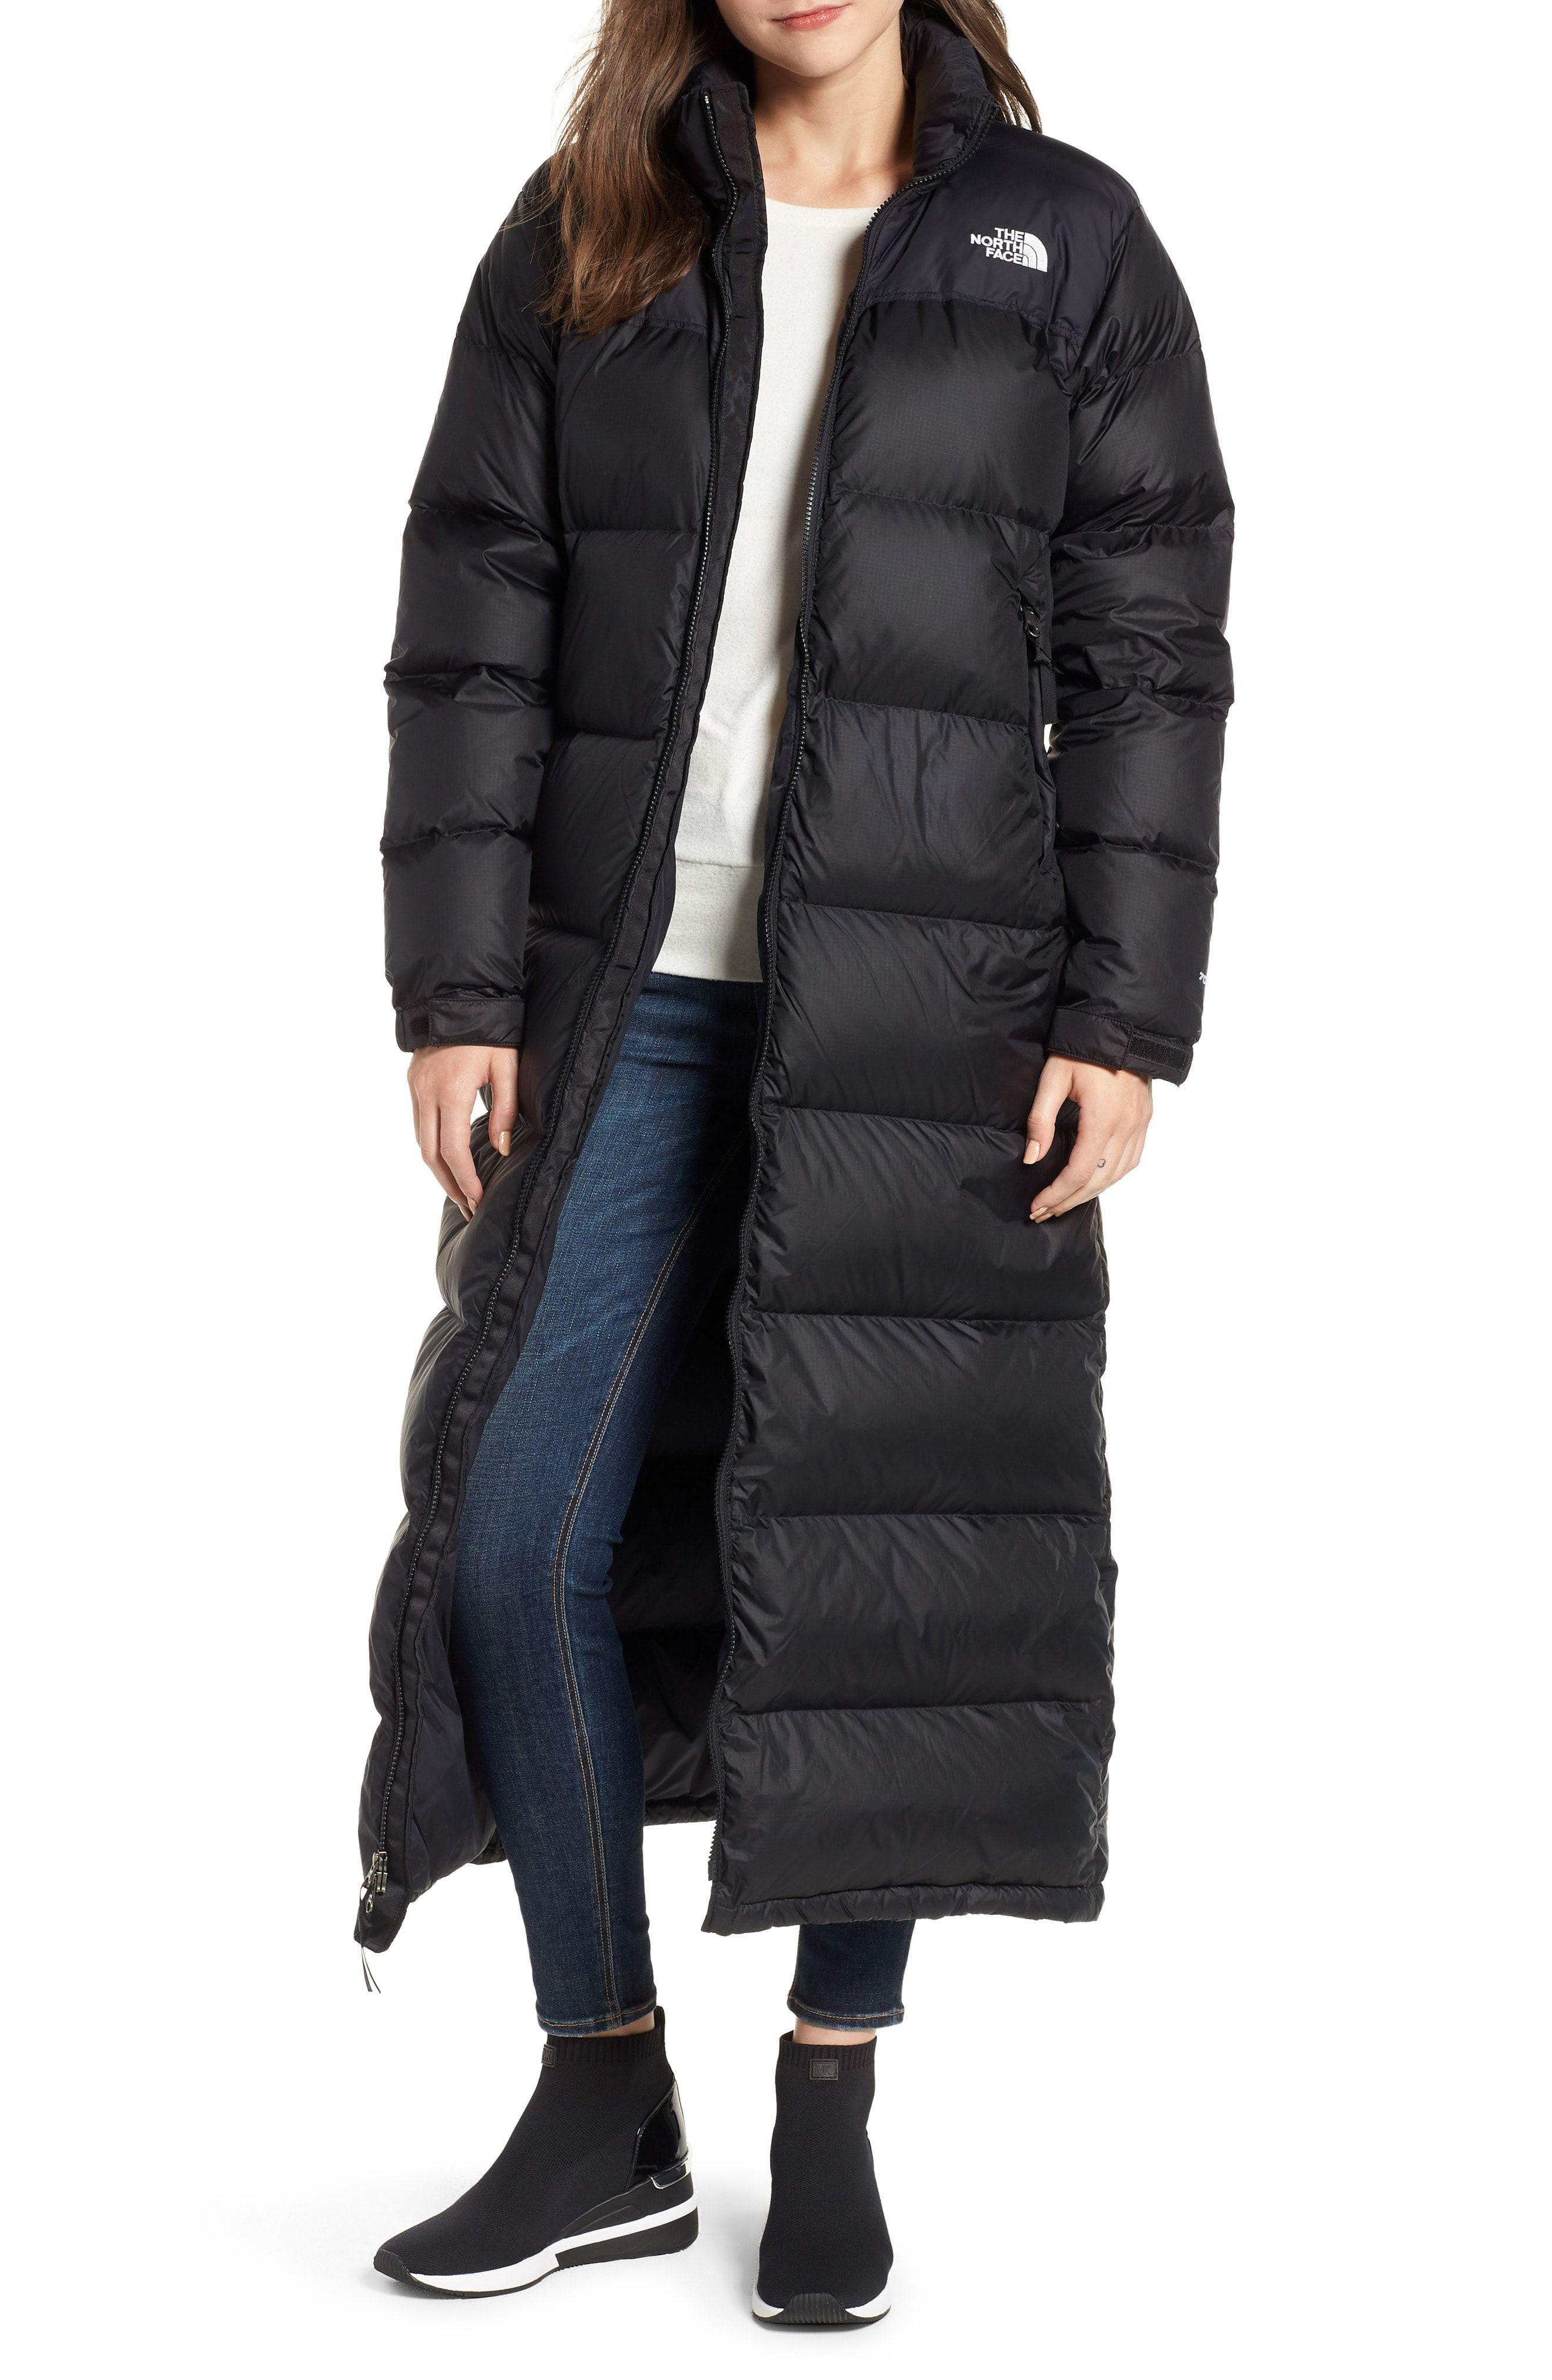 Black Winter Down Coats Choosmeinstyle Long North Face Jacket North Face Puffer Jacket Down Coat [ 4048 x 2640 Pixel ]